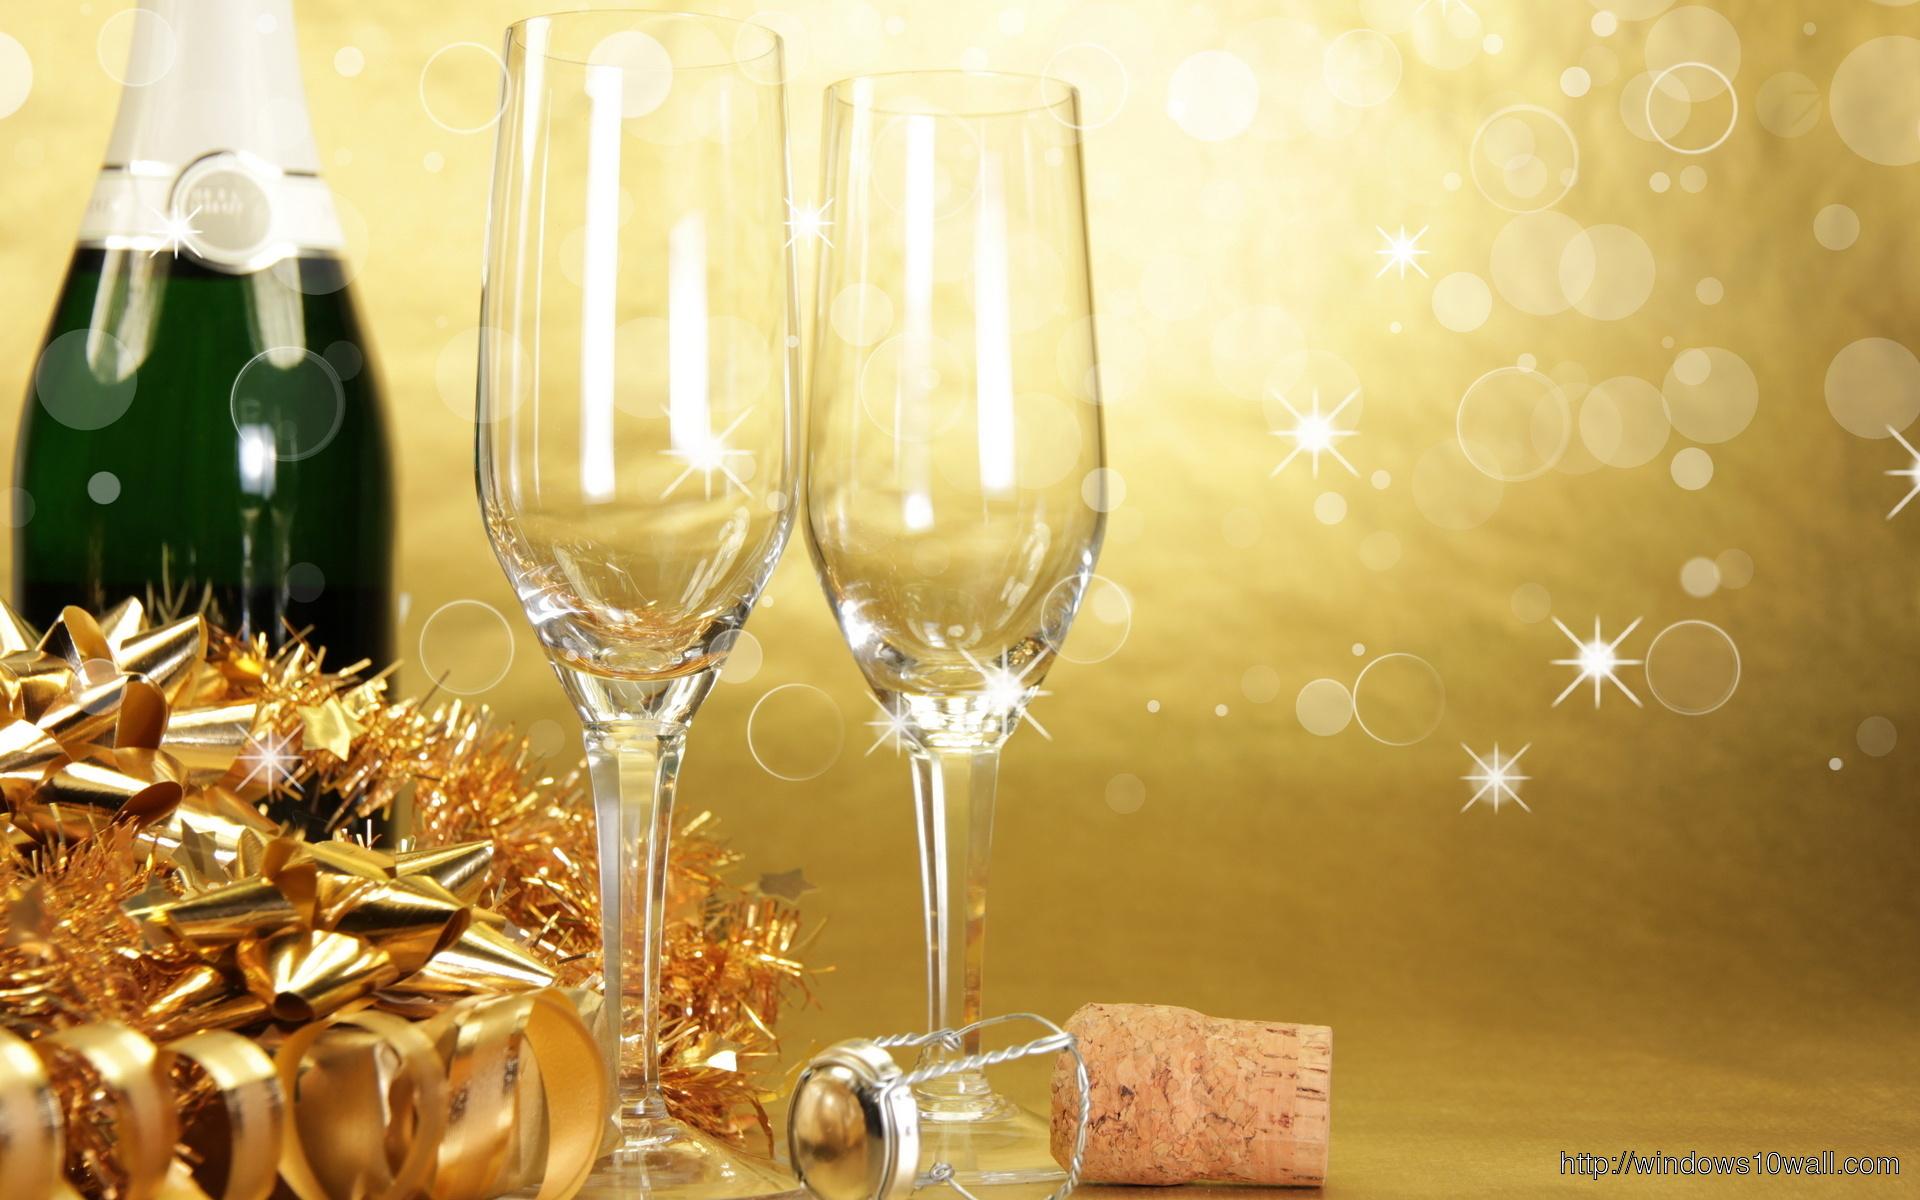 Champagne Glasses on Golden Background Wallpaper